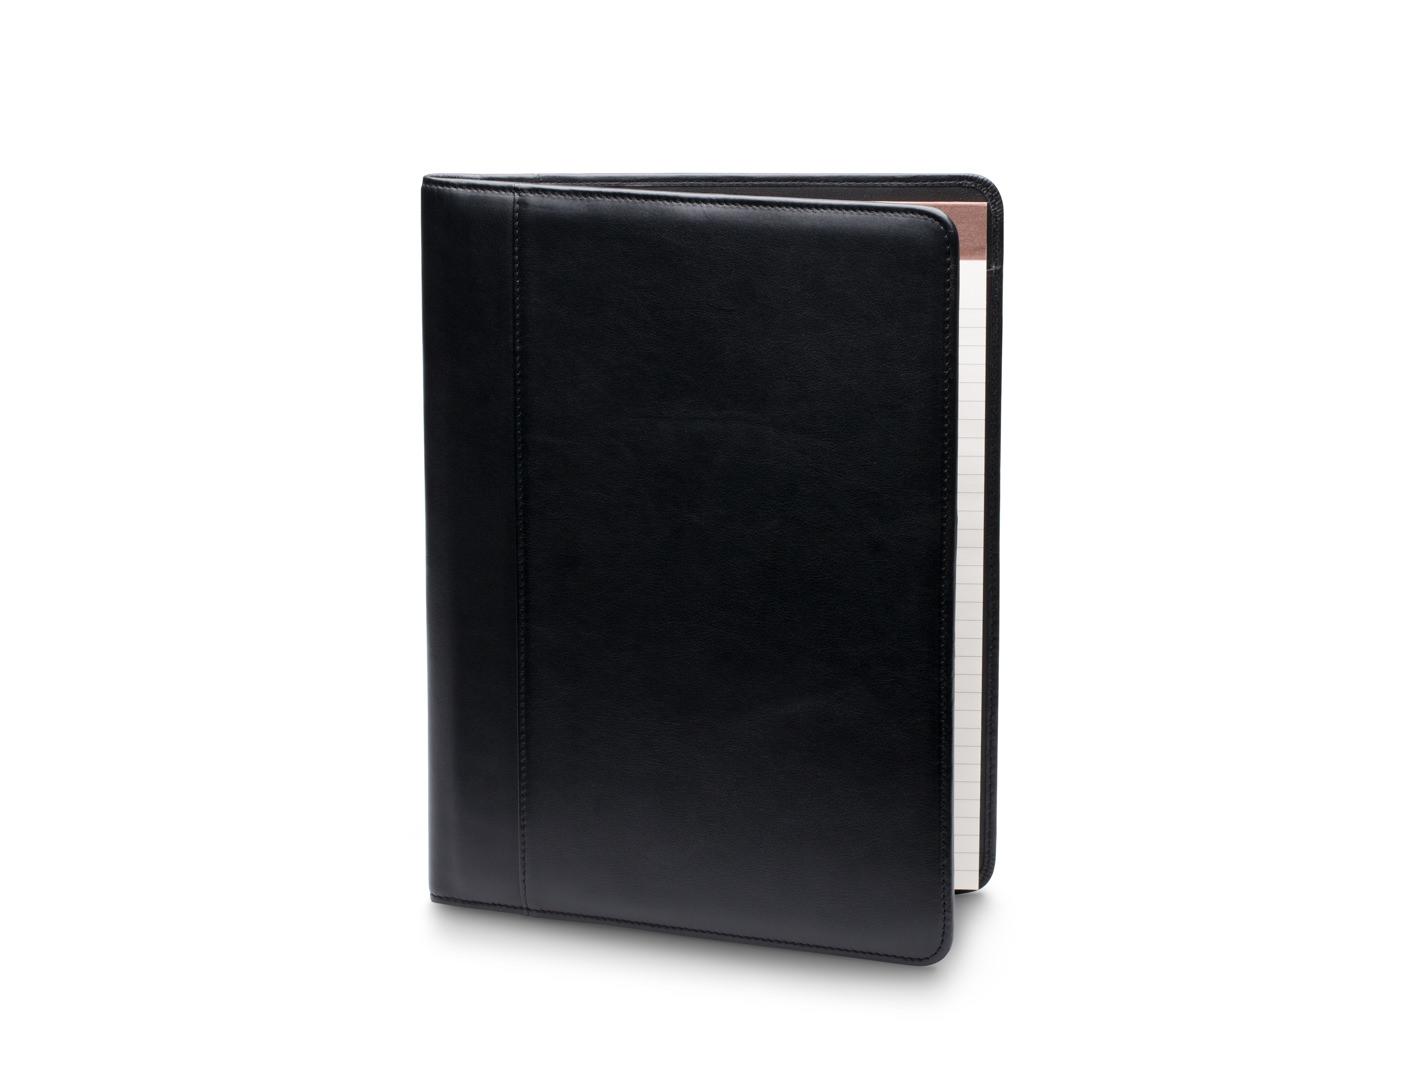 8 1/2 X 11 Writing Pad Cover-251 Black - 251 Black